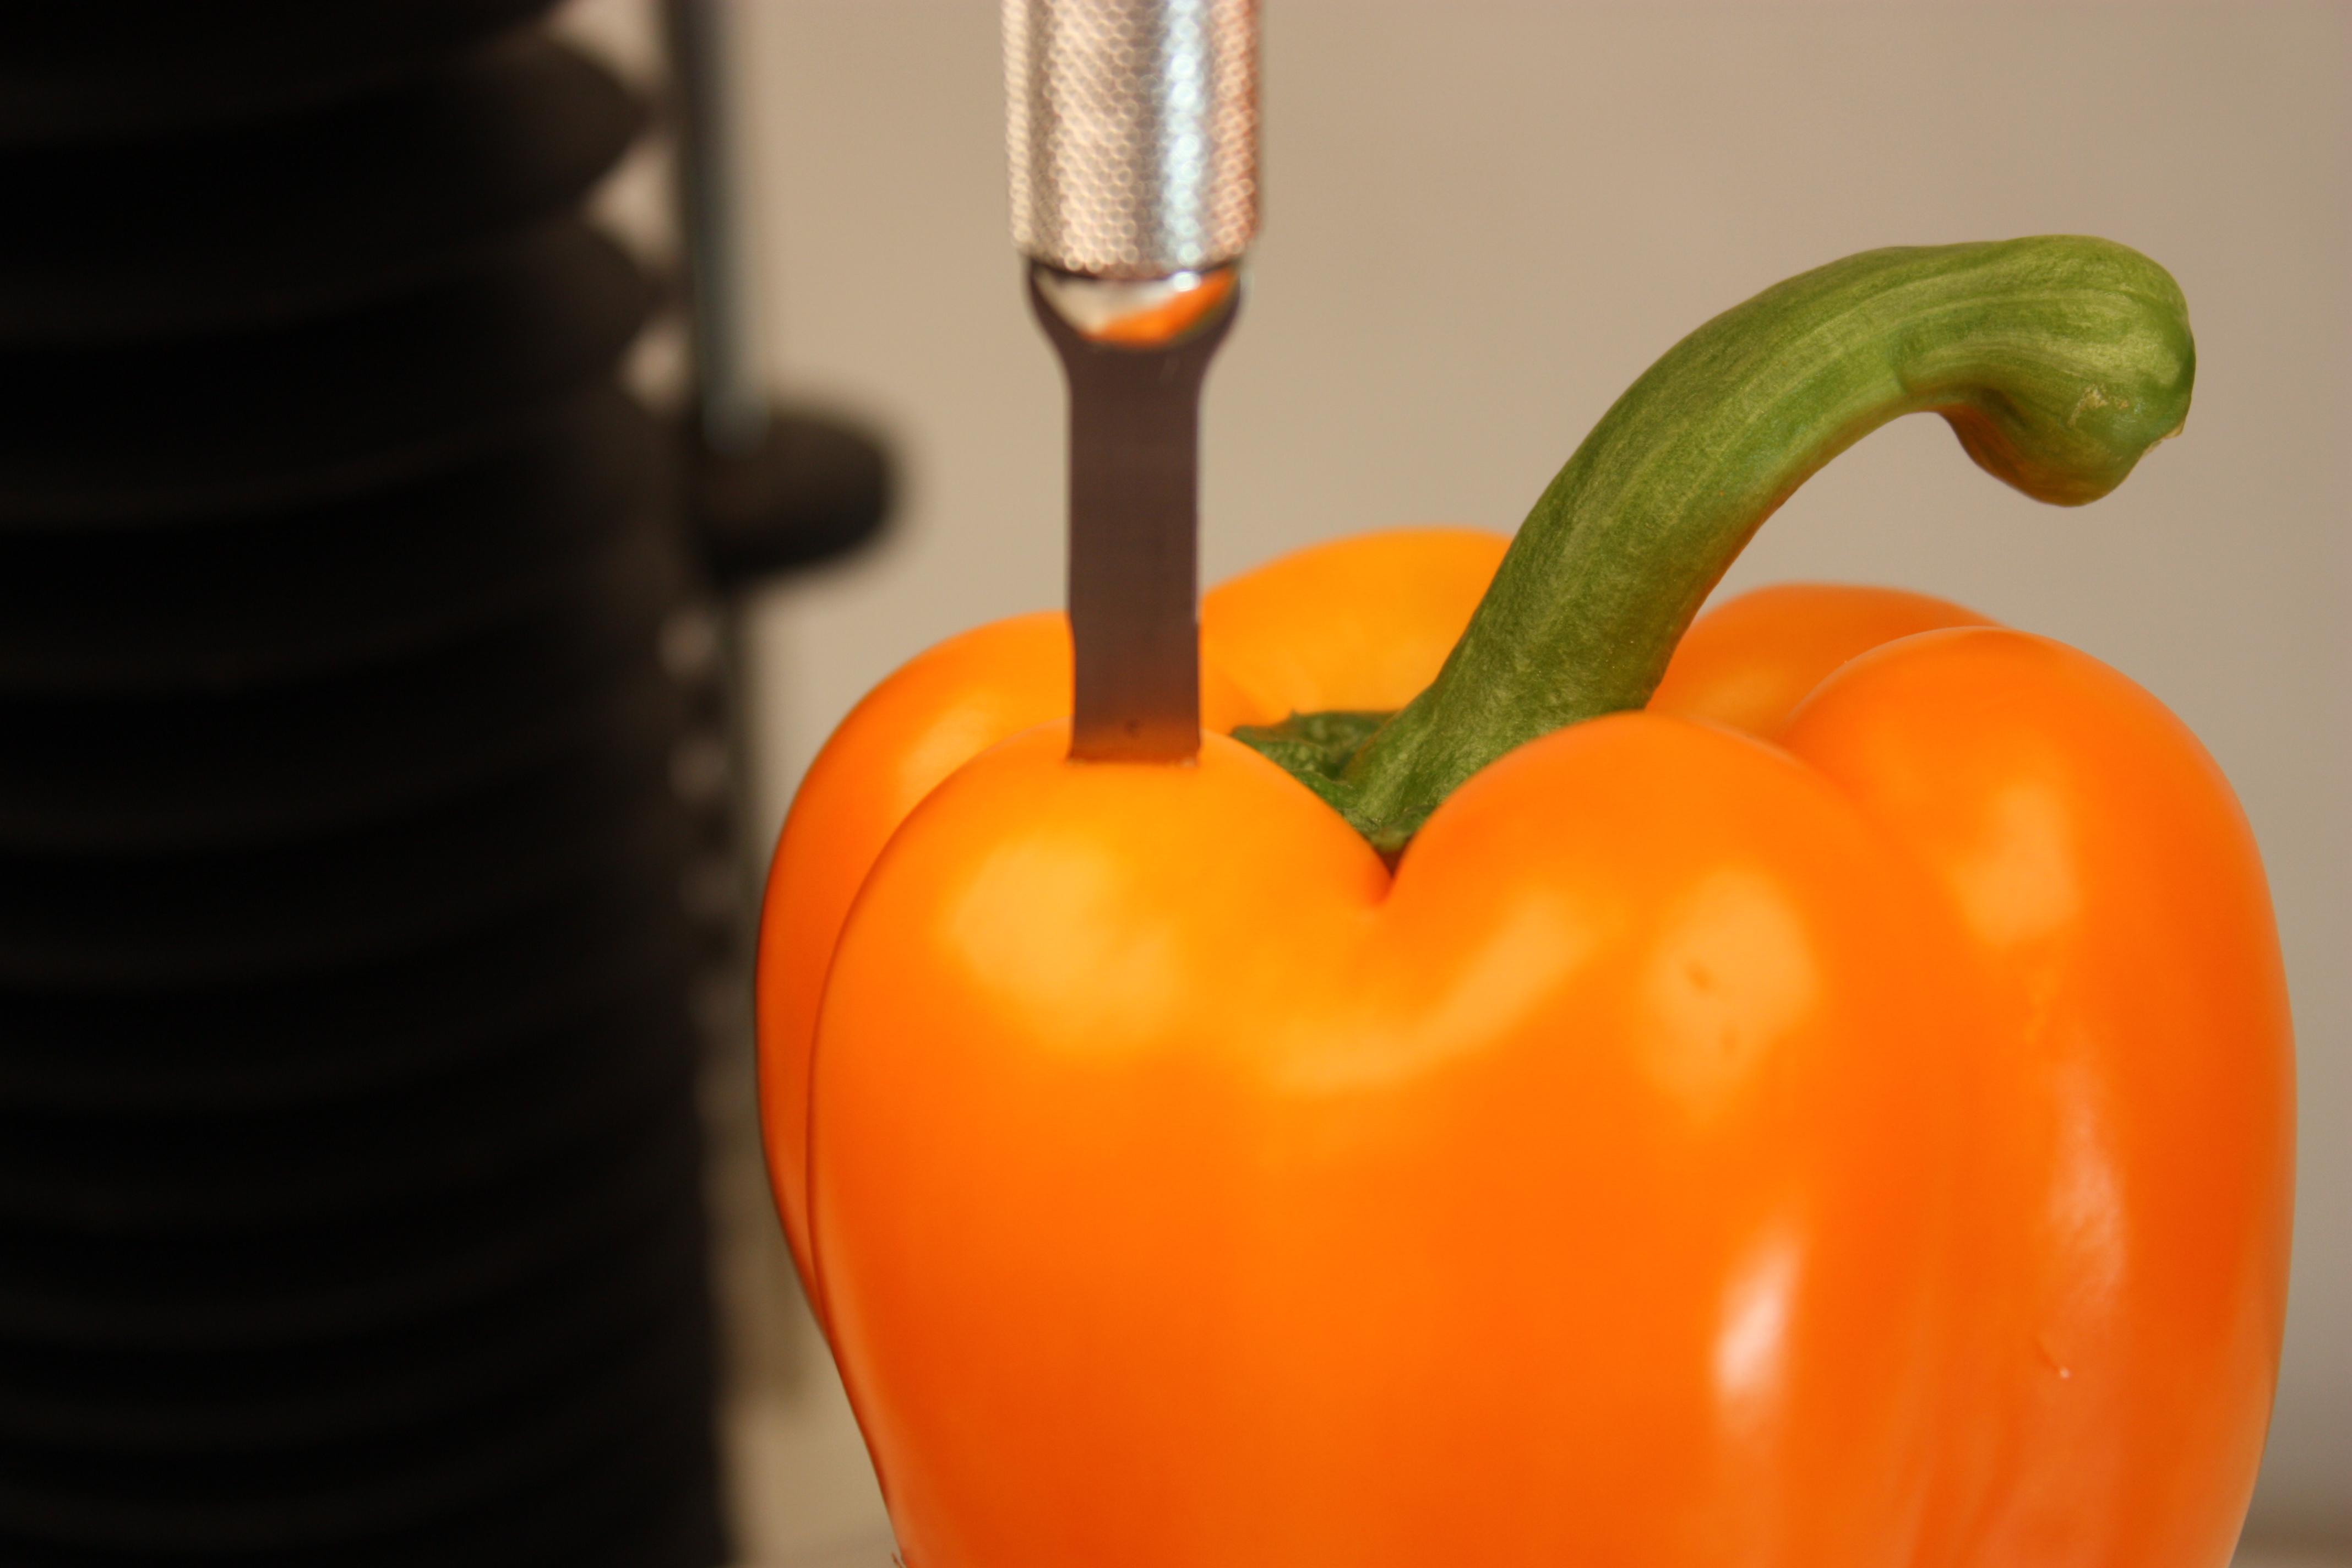 Testing pepper